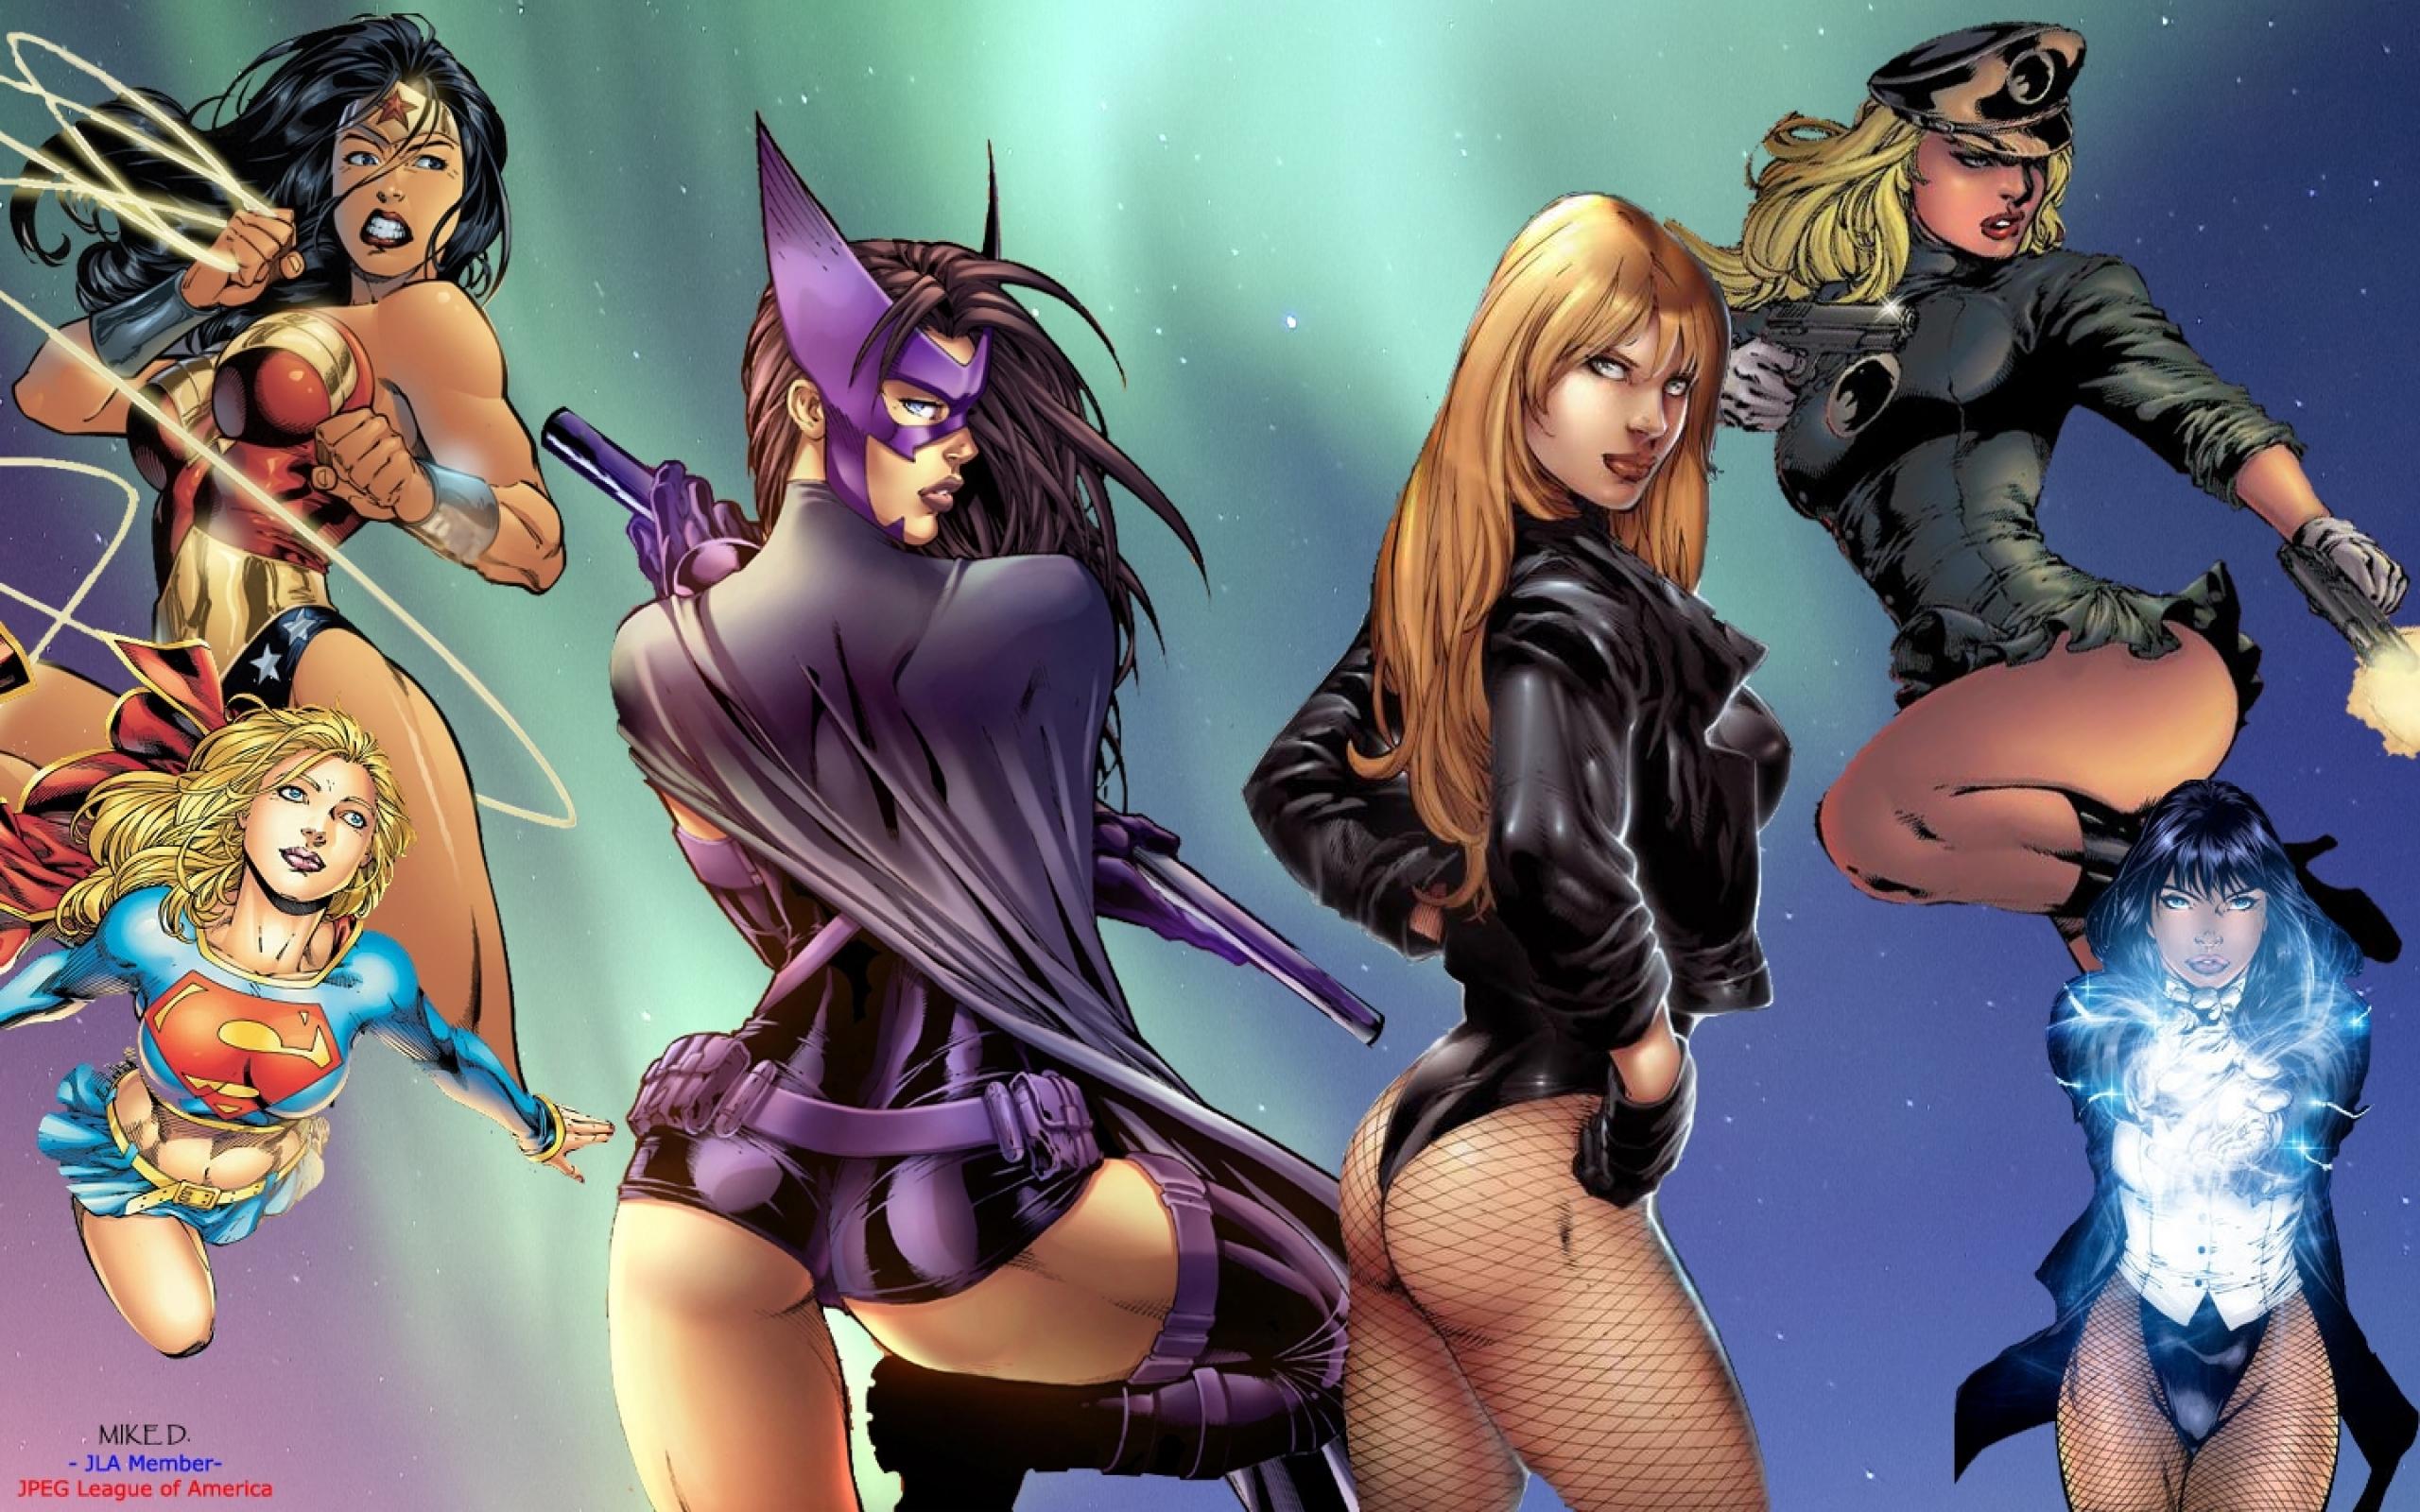 Download Wallpapers Download 2560x1600 dc comics wonder woman black 2560x1600